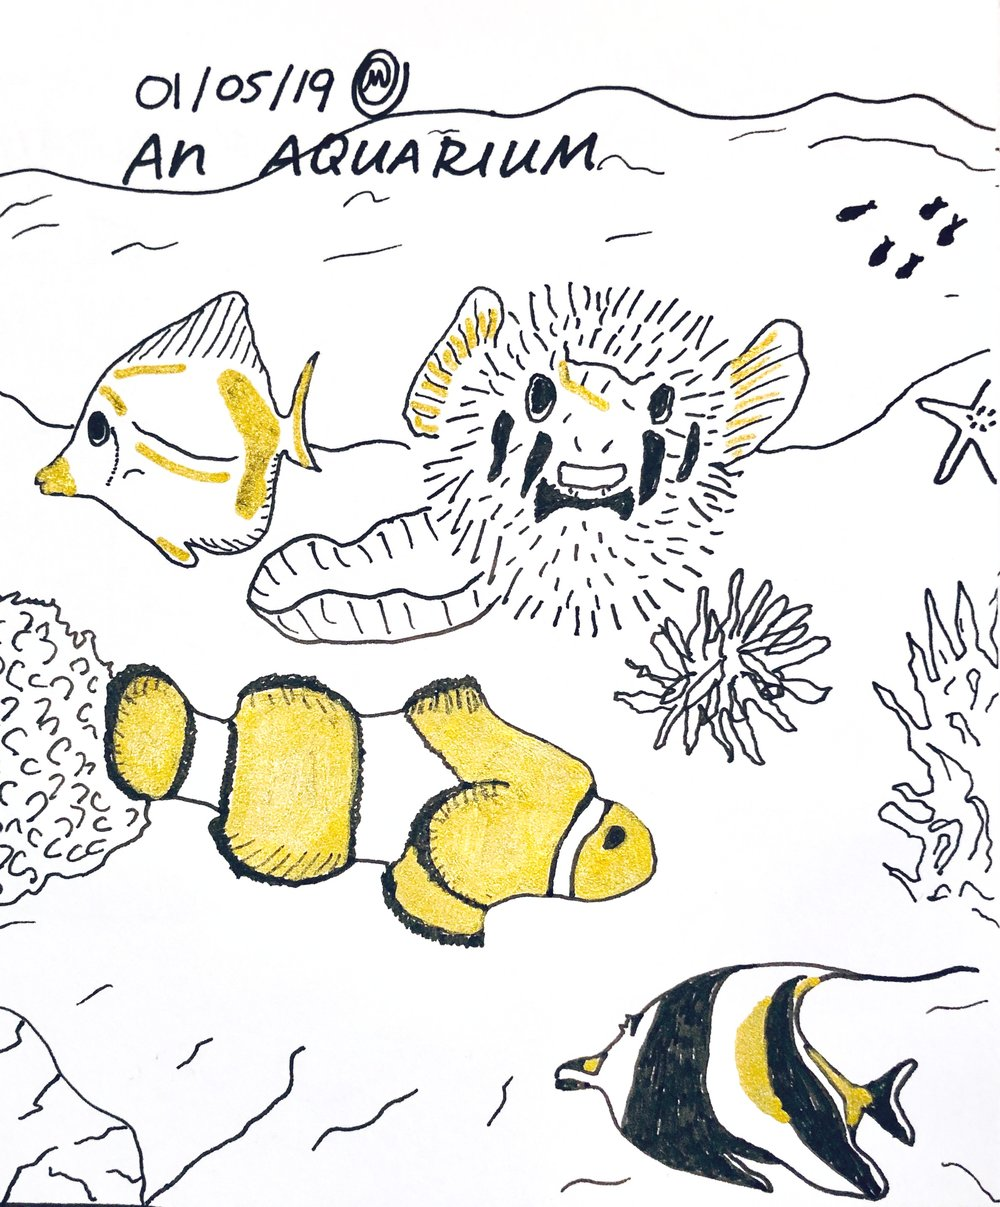 An Aquarium (Salt Water)